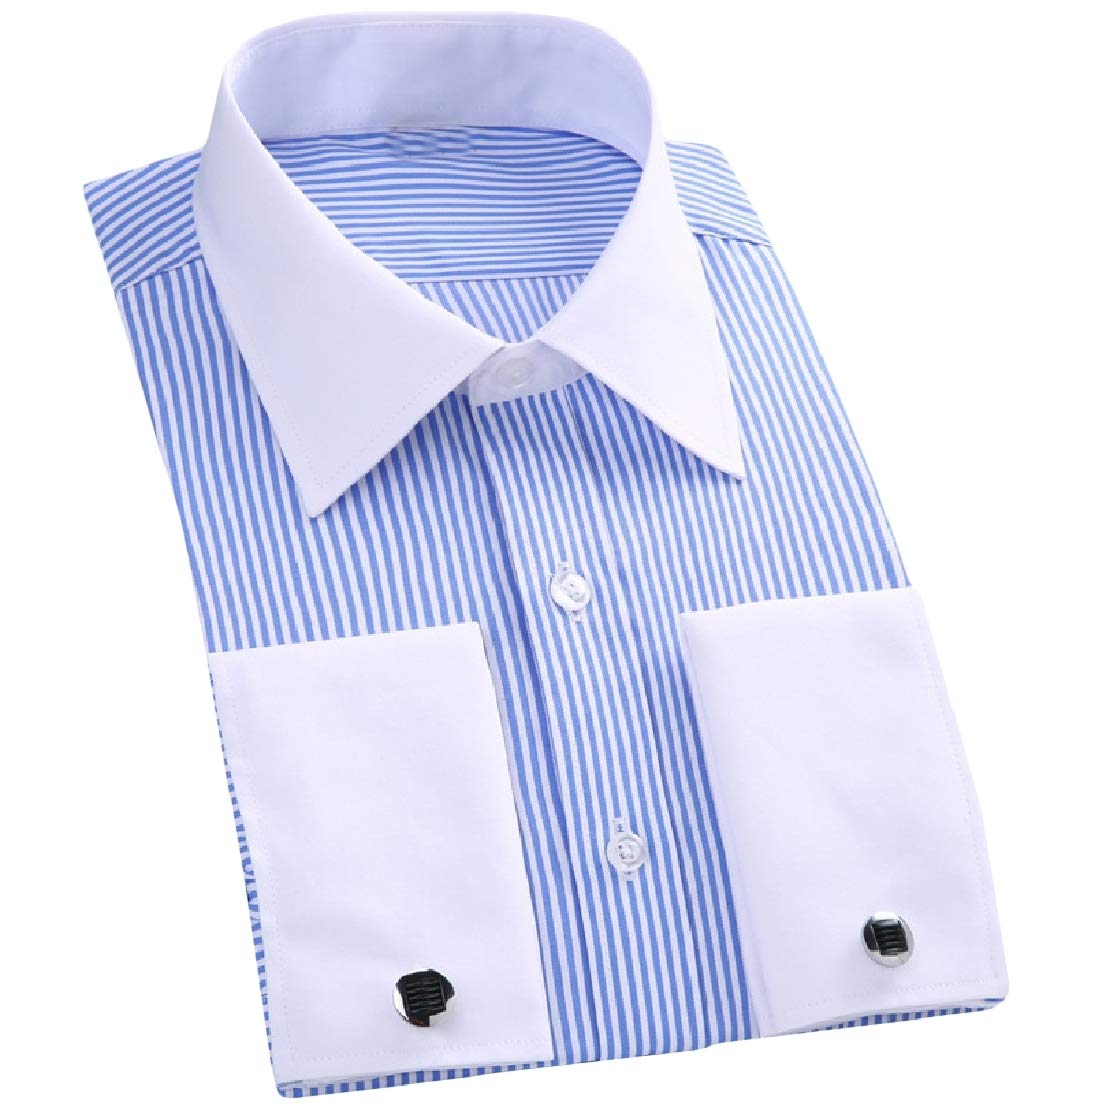 Joe Wenko Mens No-Iron Slim Fit Business Printed Long-Sleeve Work Shirt